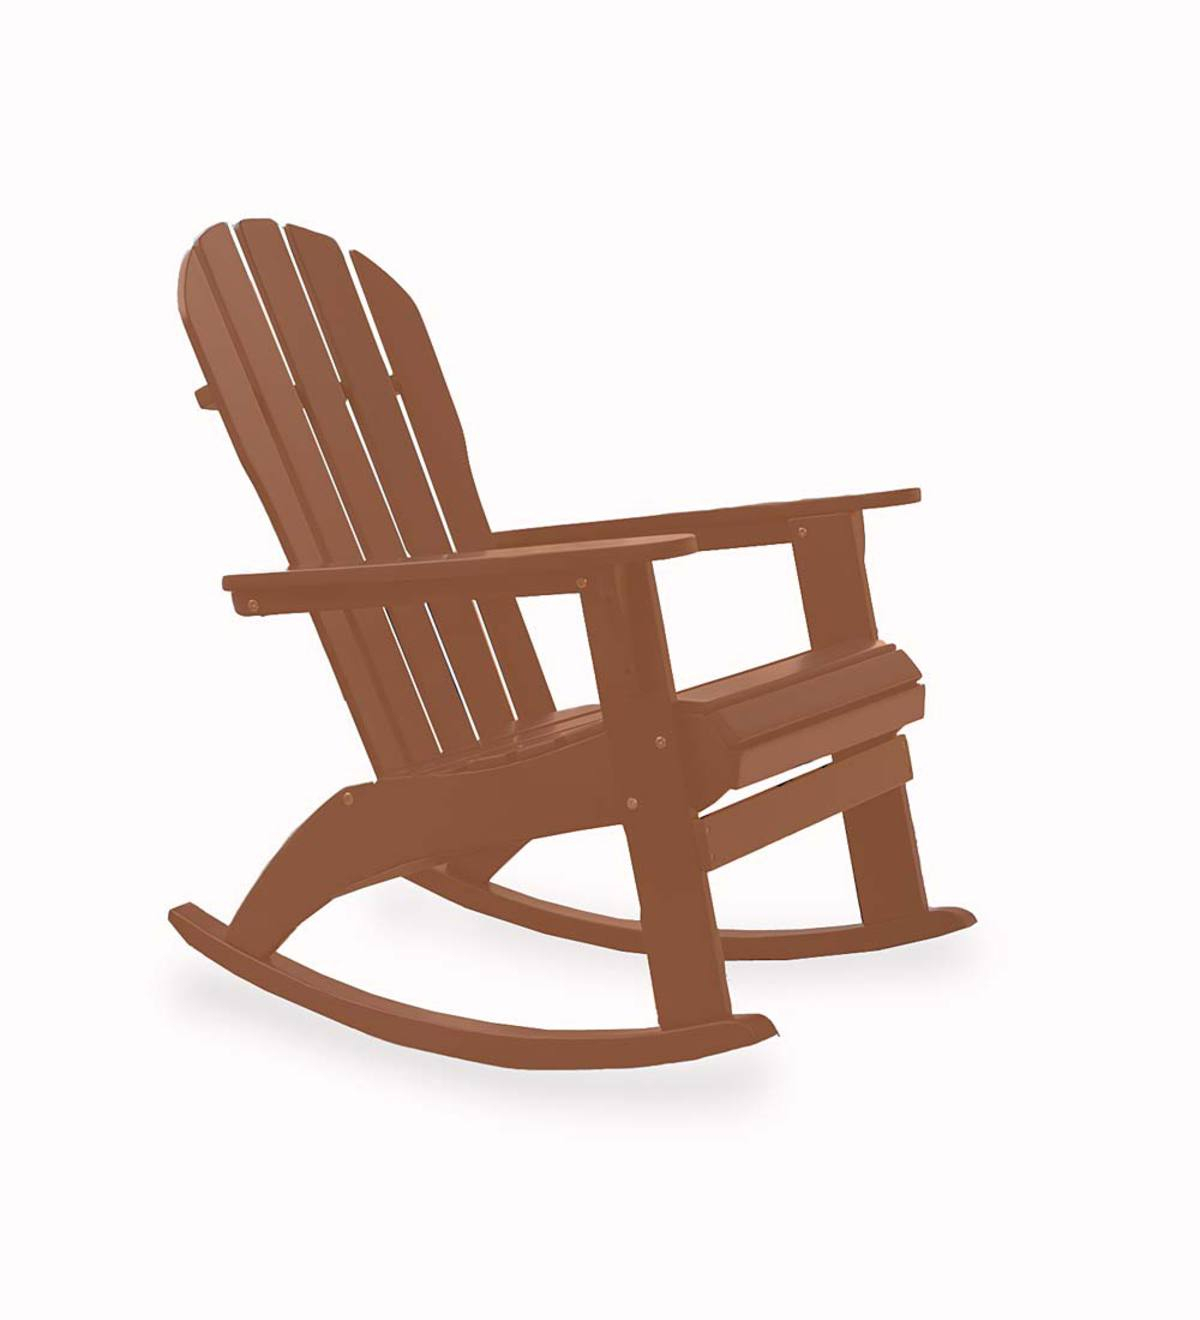 Wooden Adirondack Rocker | Plowhearth Inside Natural Brown Wood Folding Rocking Chairs (#20 of 20)